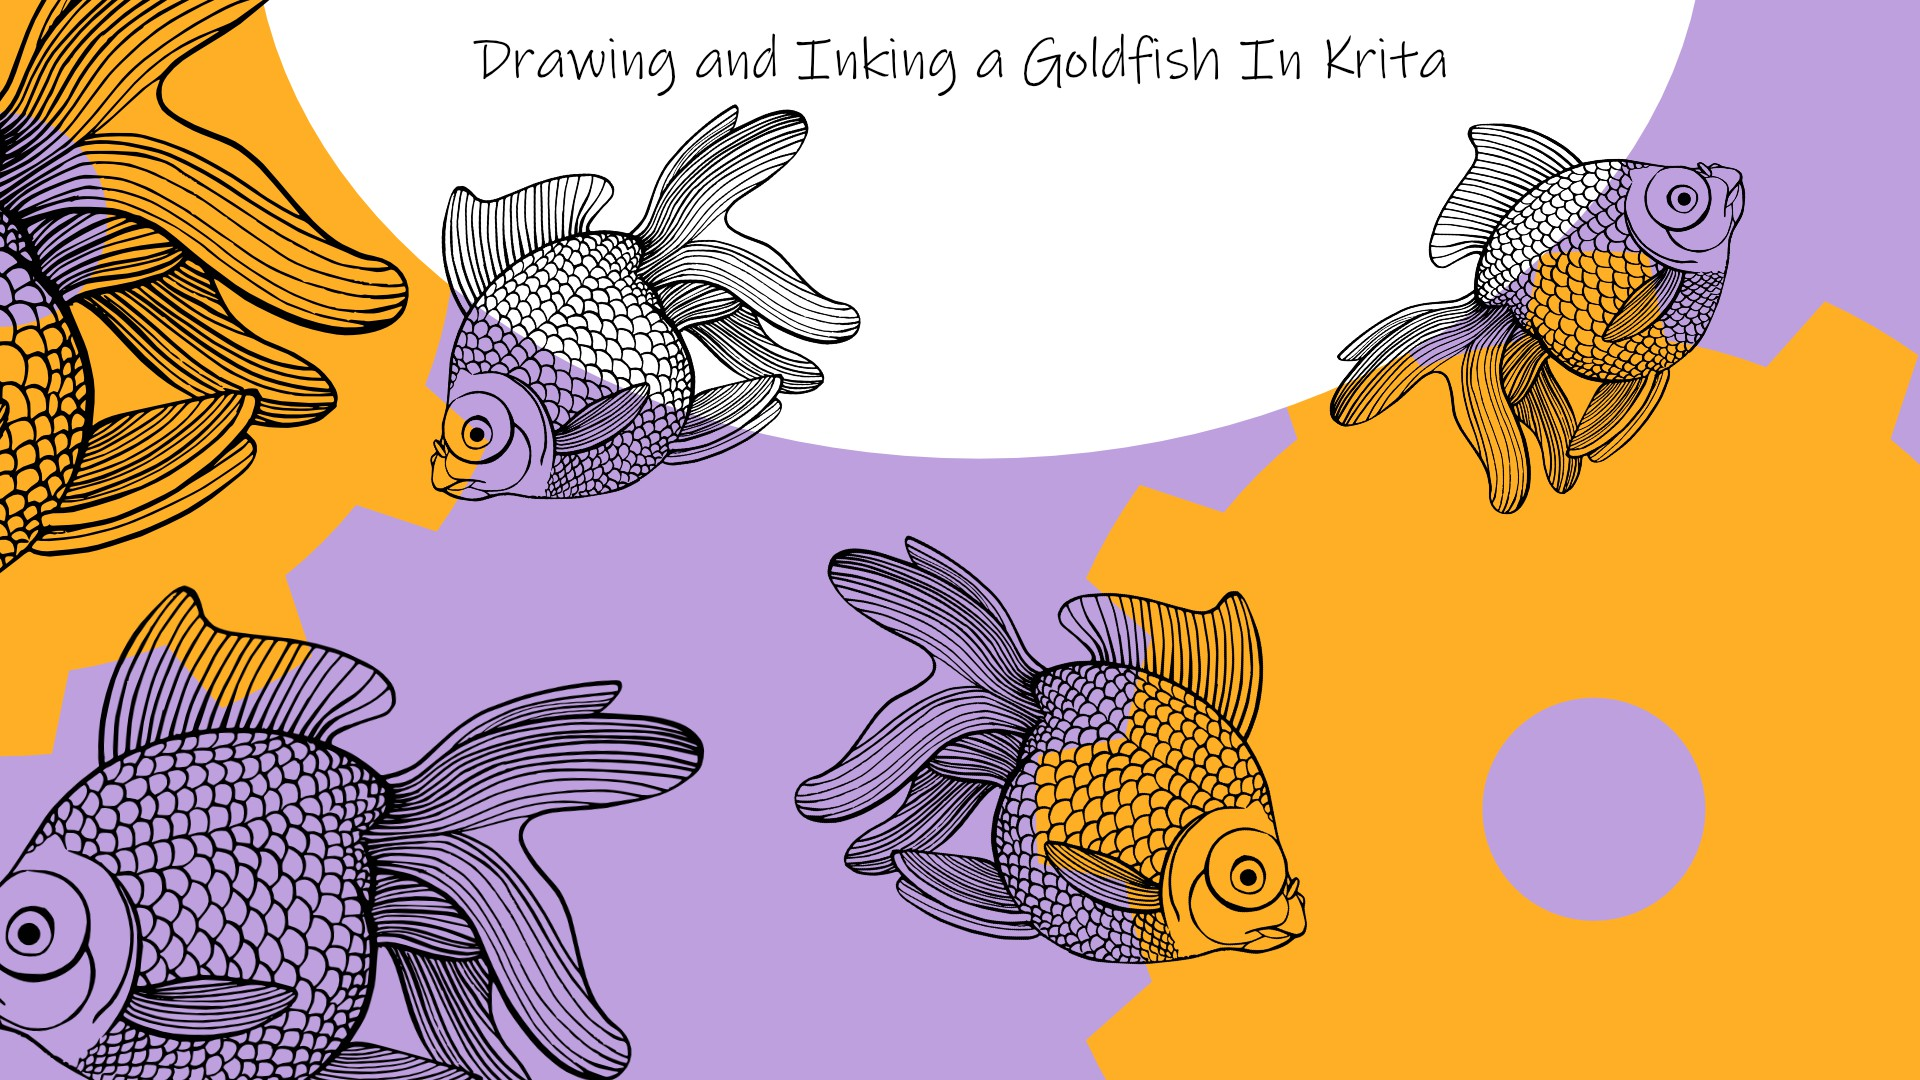 Drawing goldfish in Krita